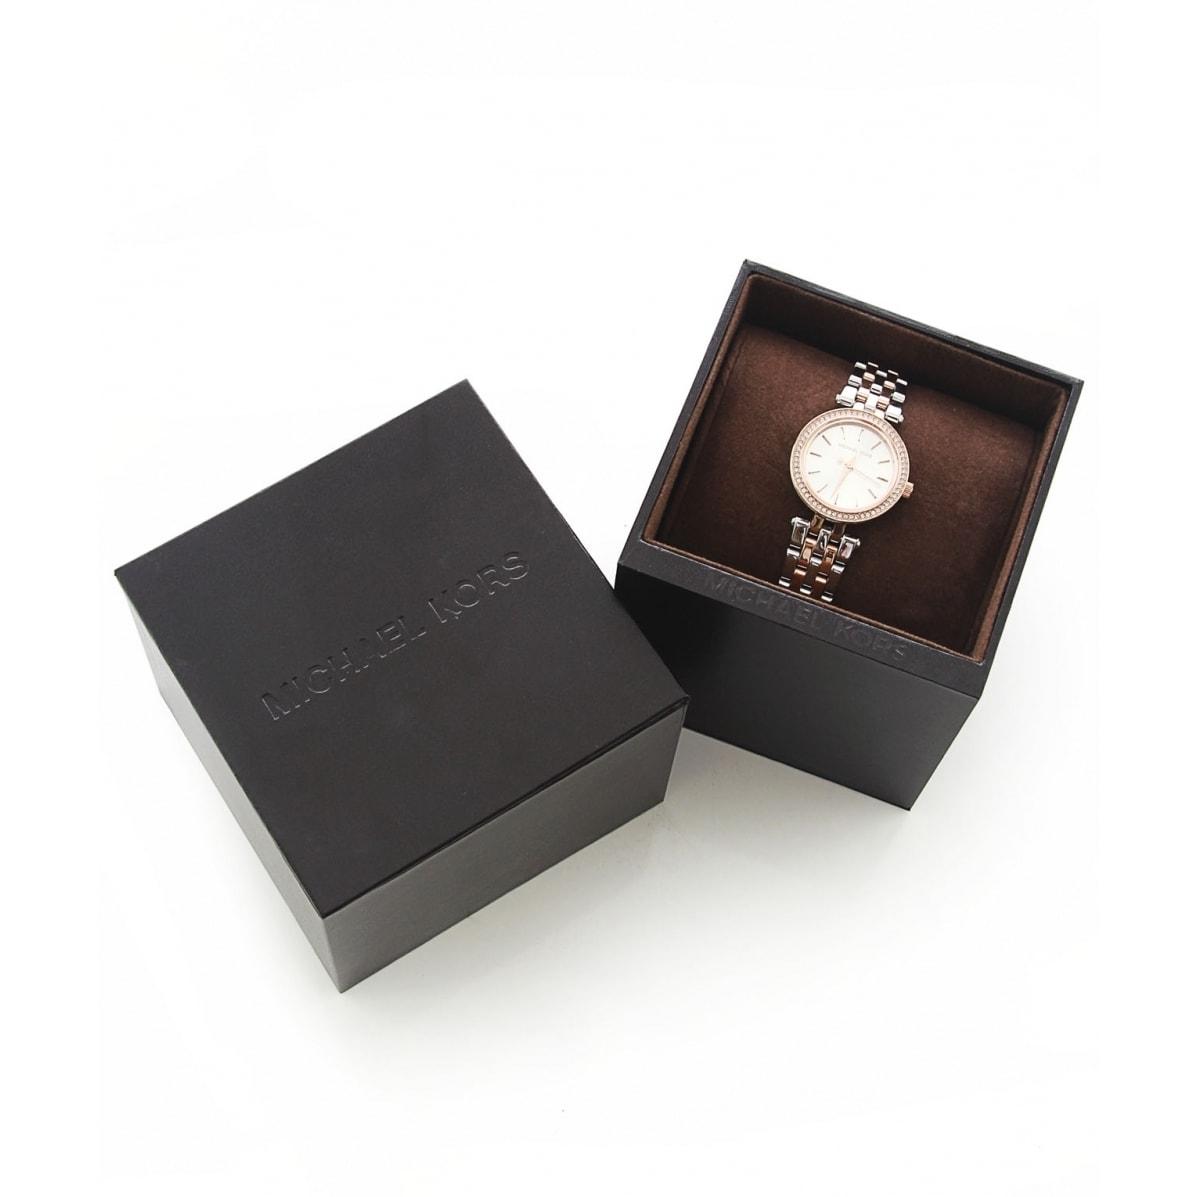 de1ac91f435f Shop Michael Kors Women s MK3298 Petite Darci Two-tone Crystal Bezel Watch  - Free Shipping Today - Overstock - 9614004